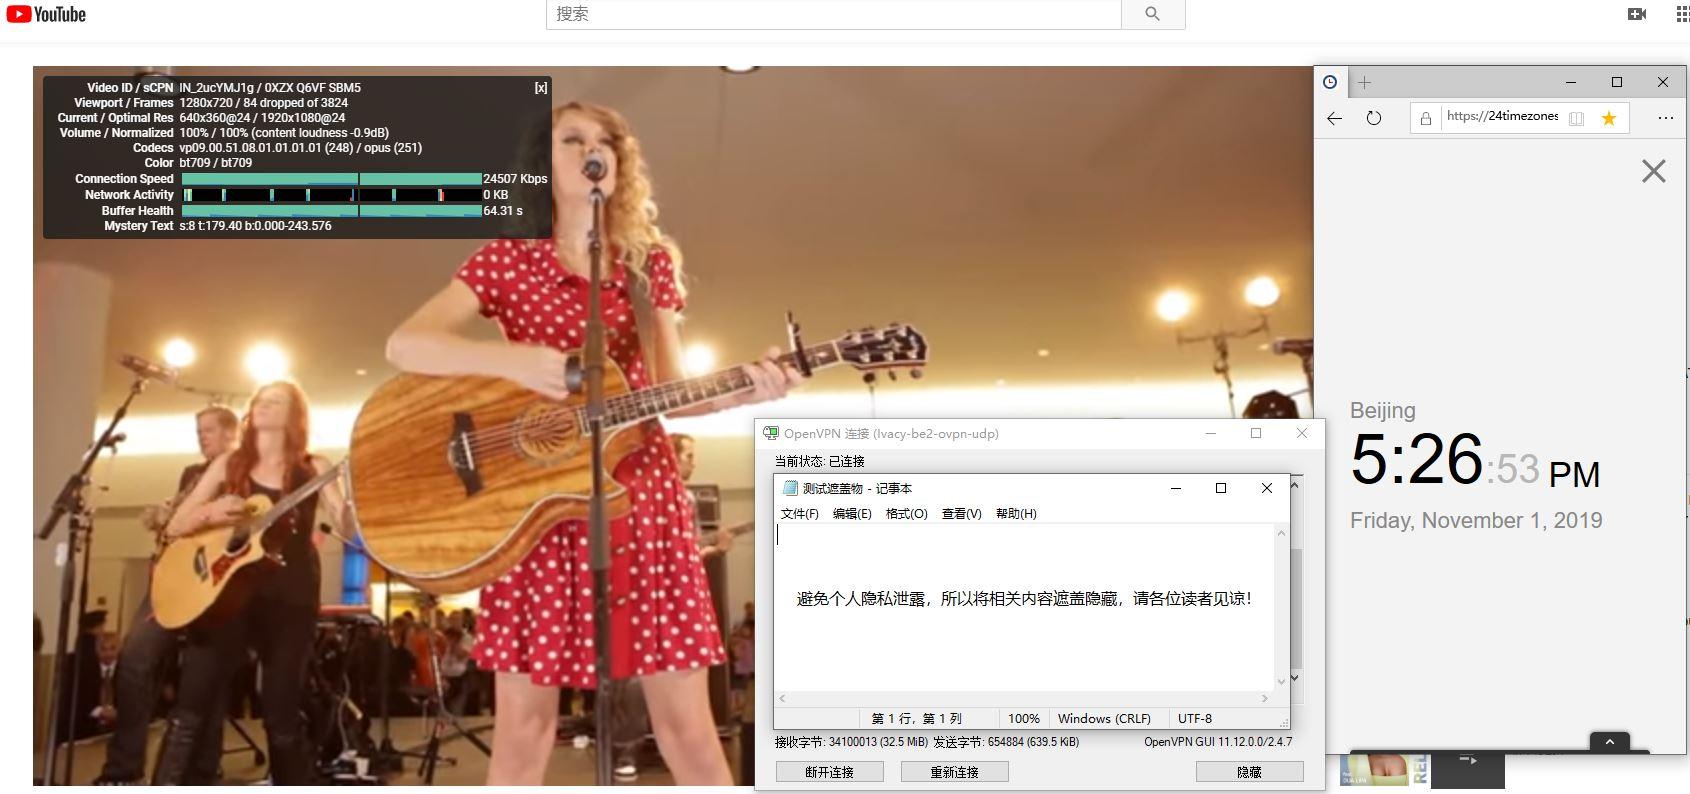 Windows IvacyVPN BE-2 中国VPN翻墙软件 科学上网 Youtube链接速度 - 20191101